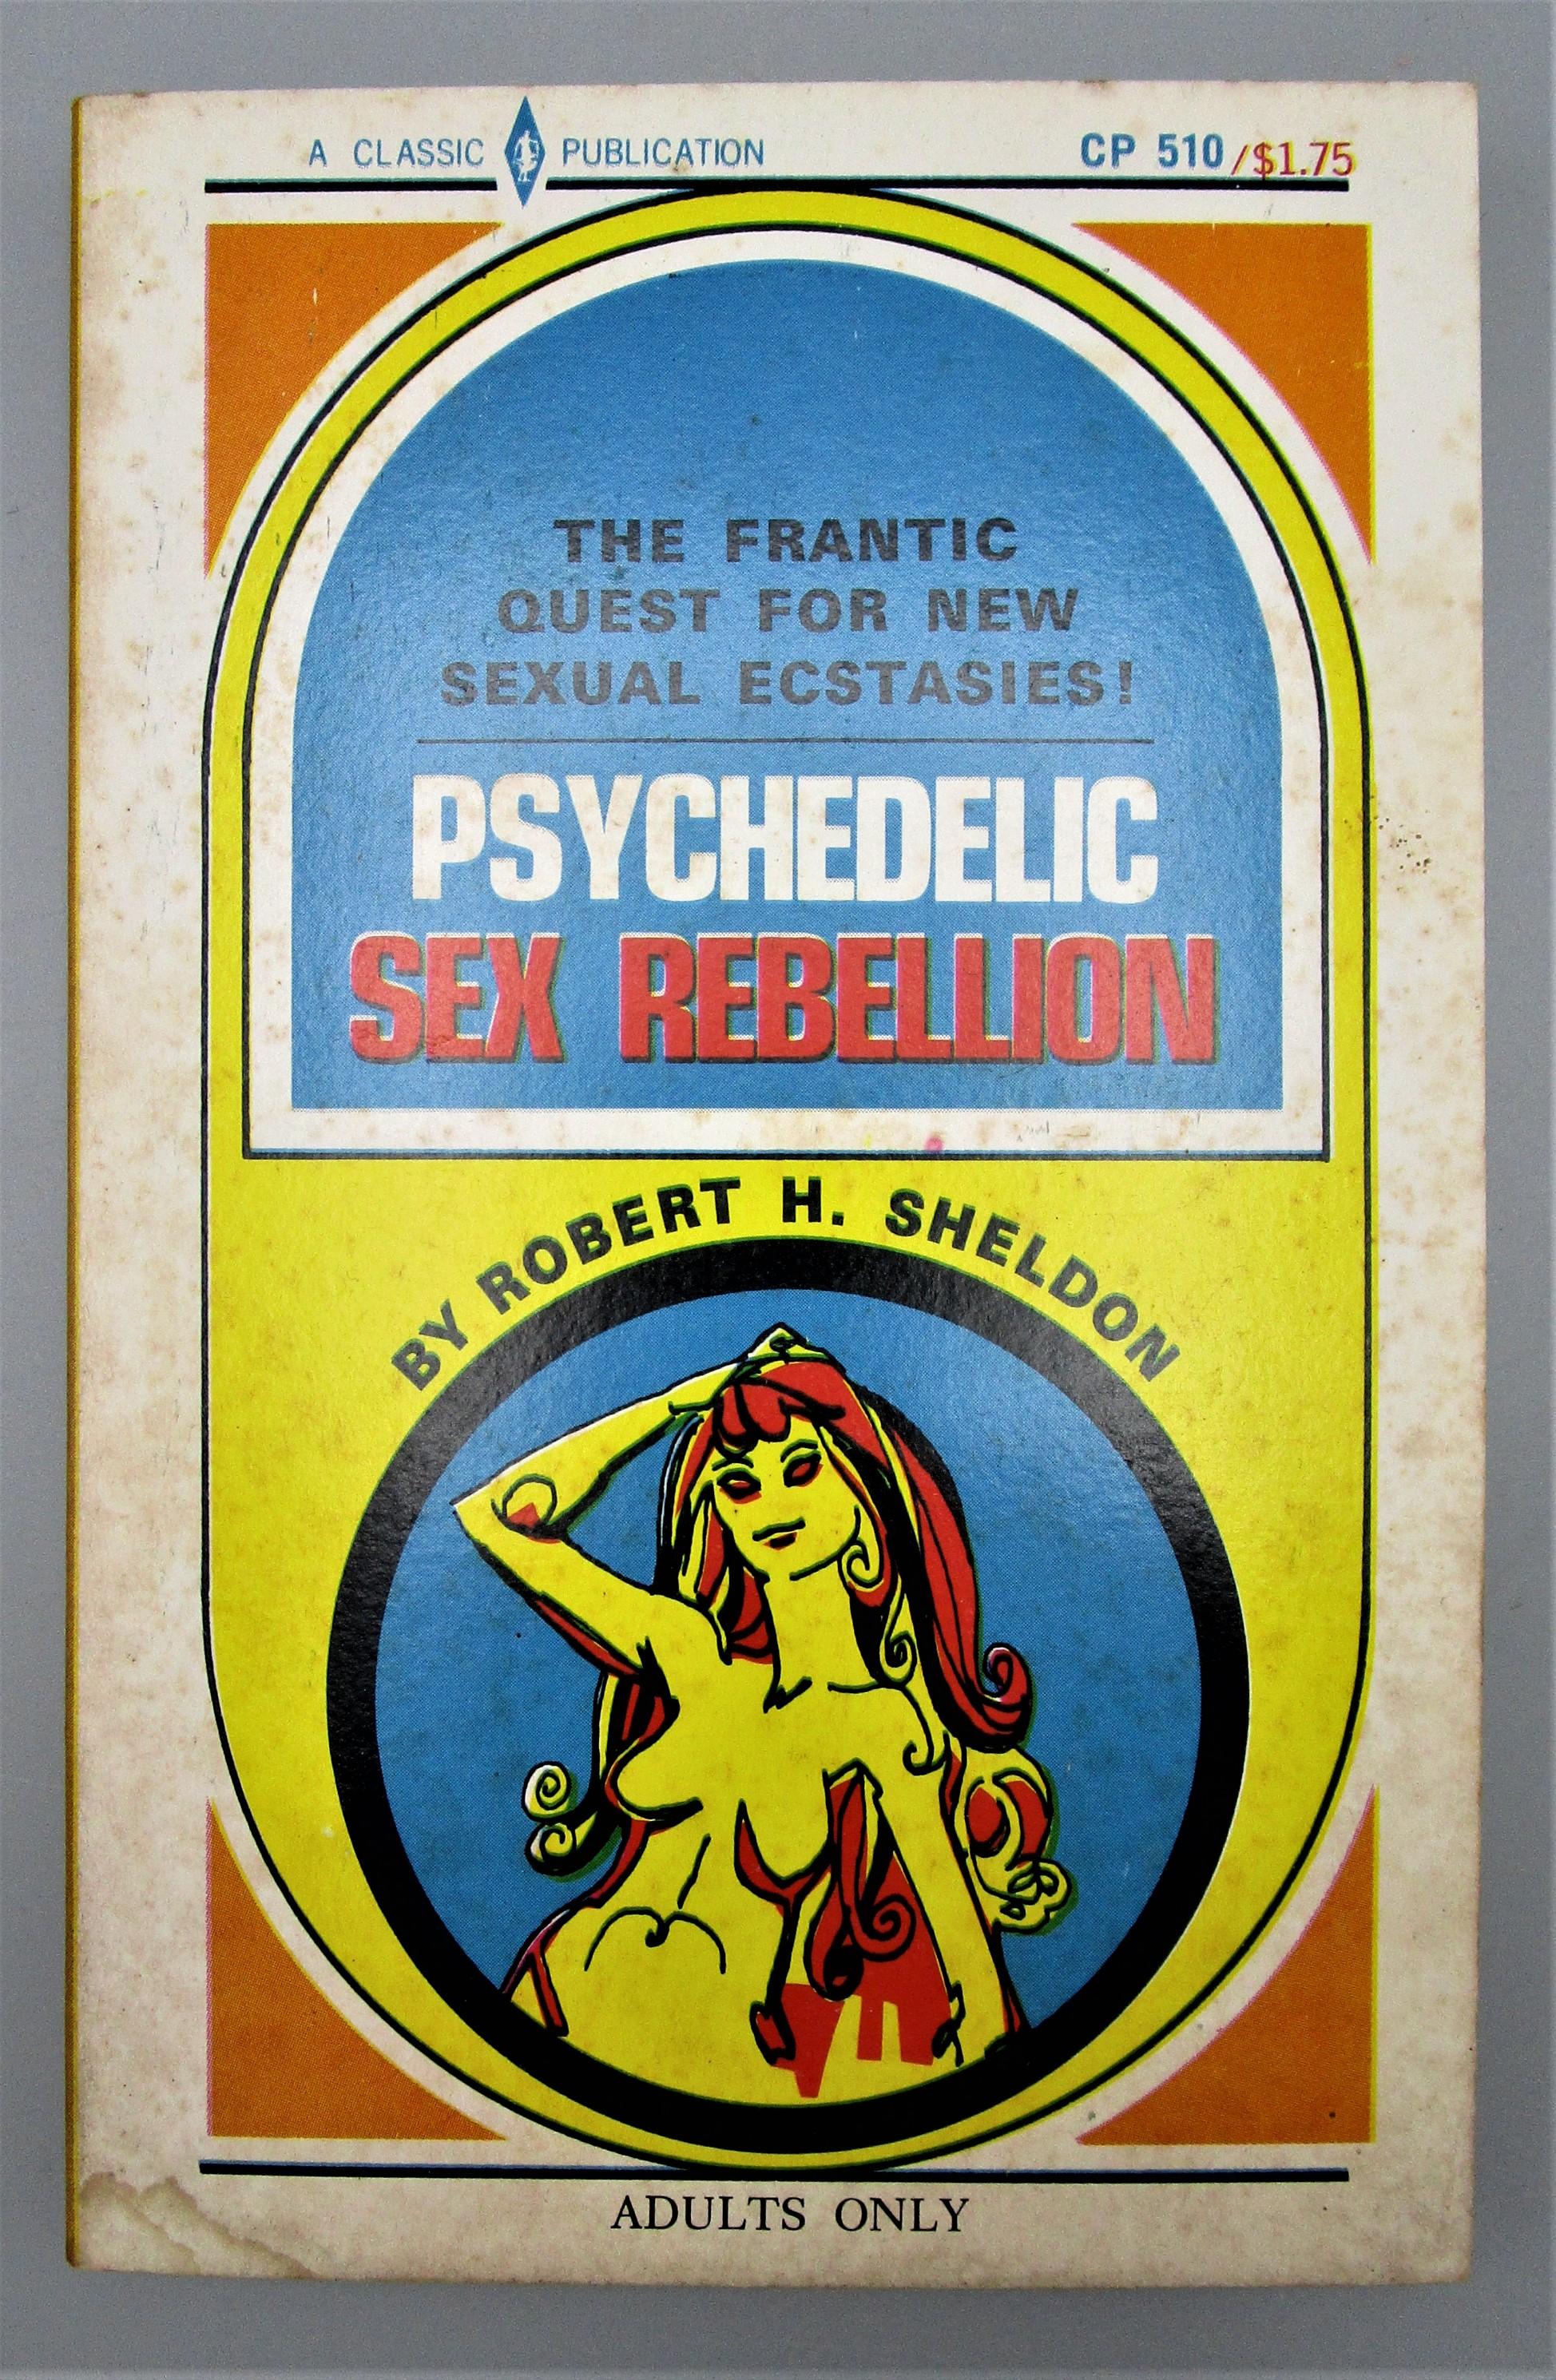 PSYCHEDELIC SEX REBELLION, by Robert H. Sheldon- 1968